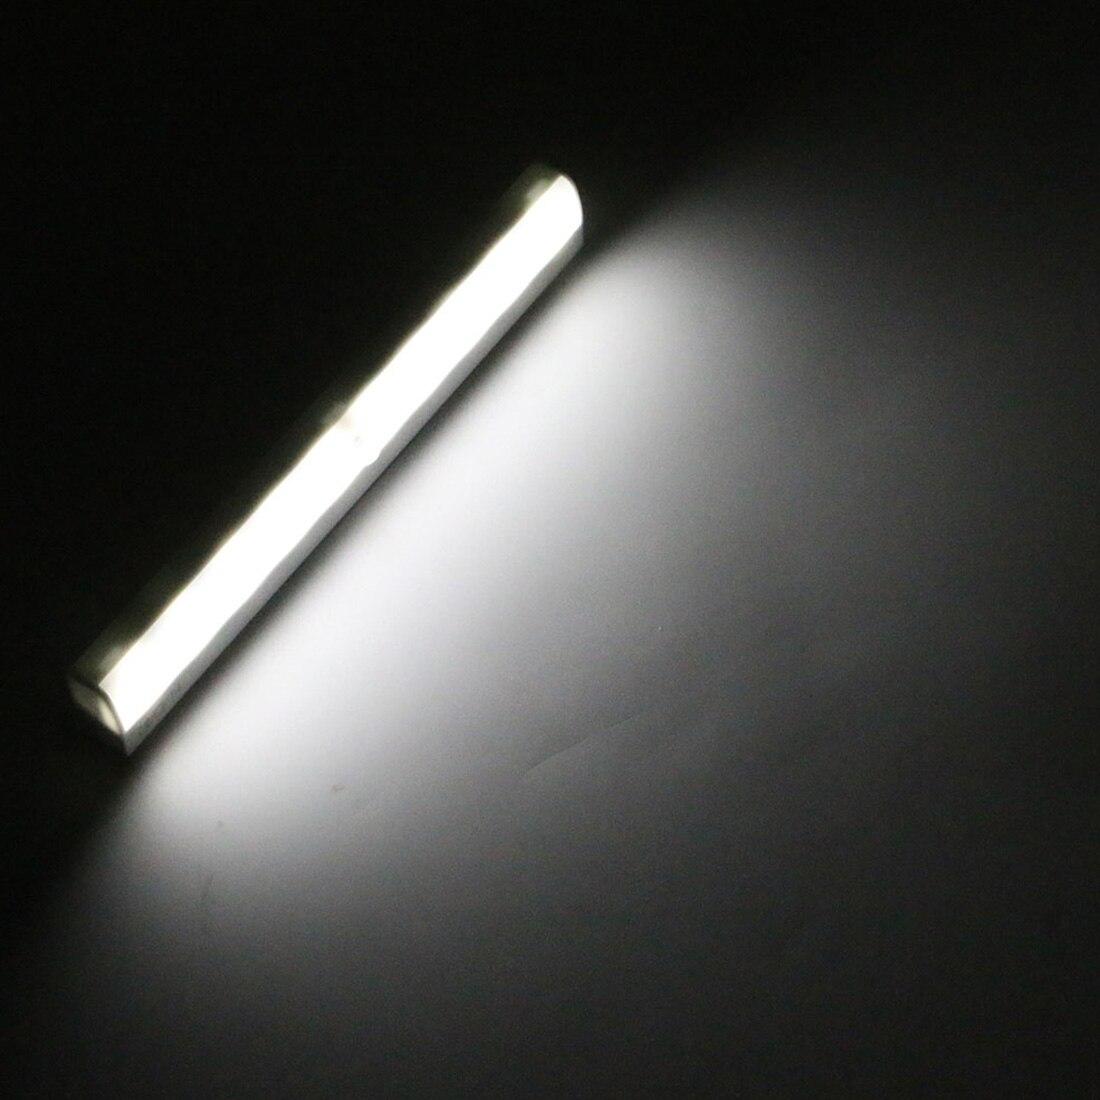 Motion Sensor Night Light Portable Sensitive Closet Wall LED Lights Battery Powered Wireless Cabinet IR Infrared Motion Detector